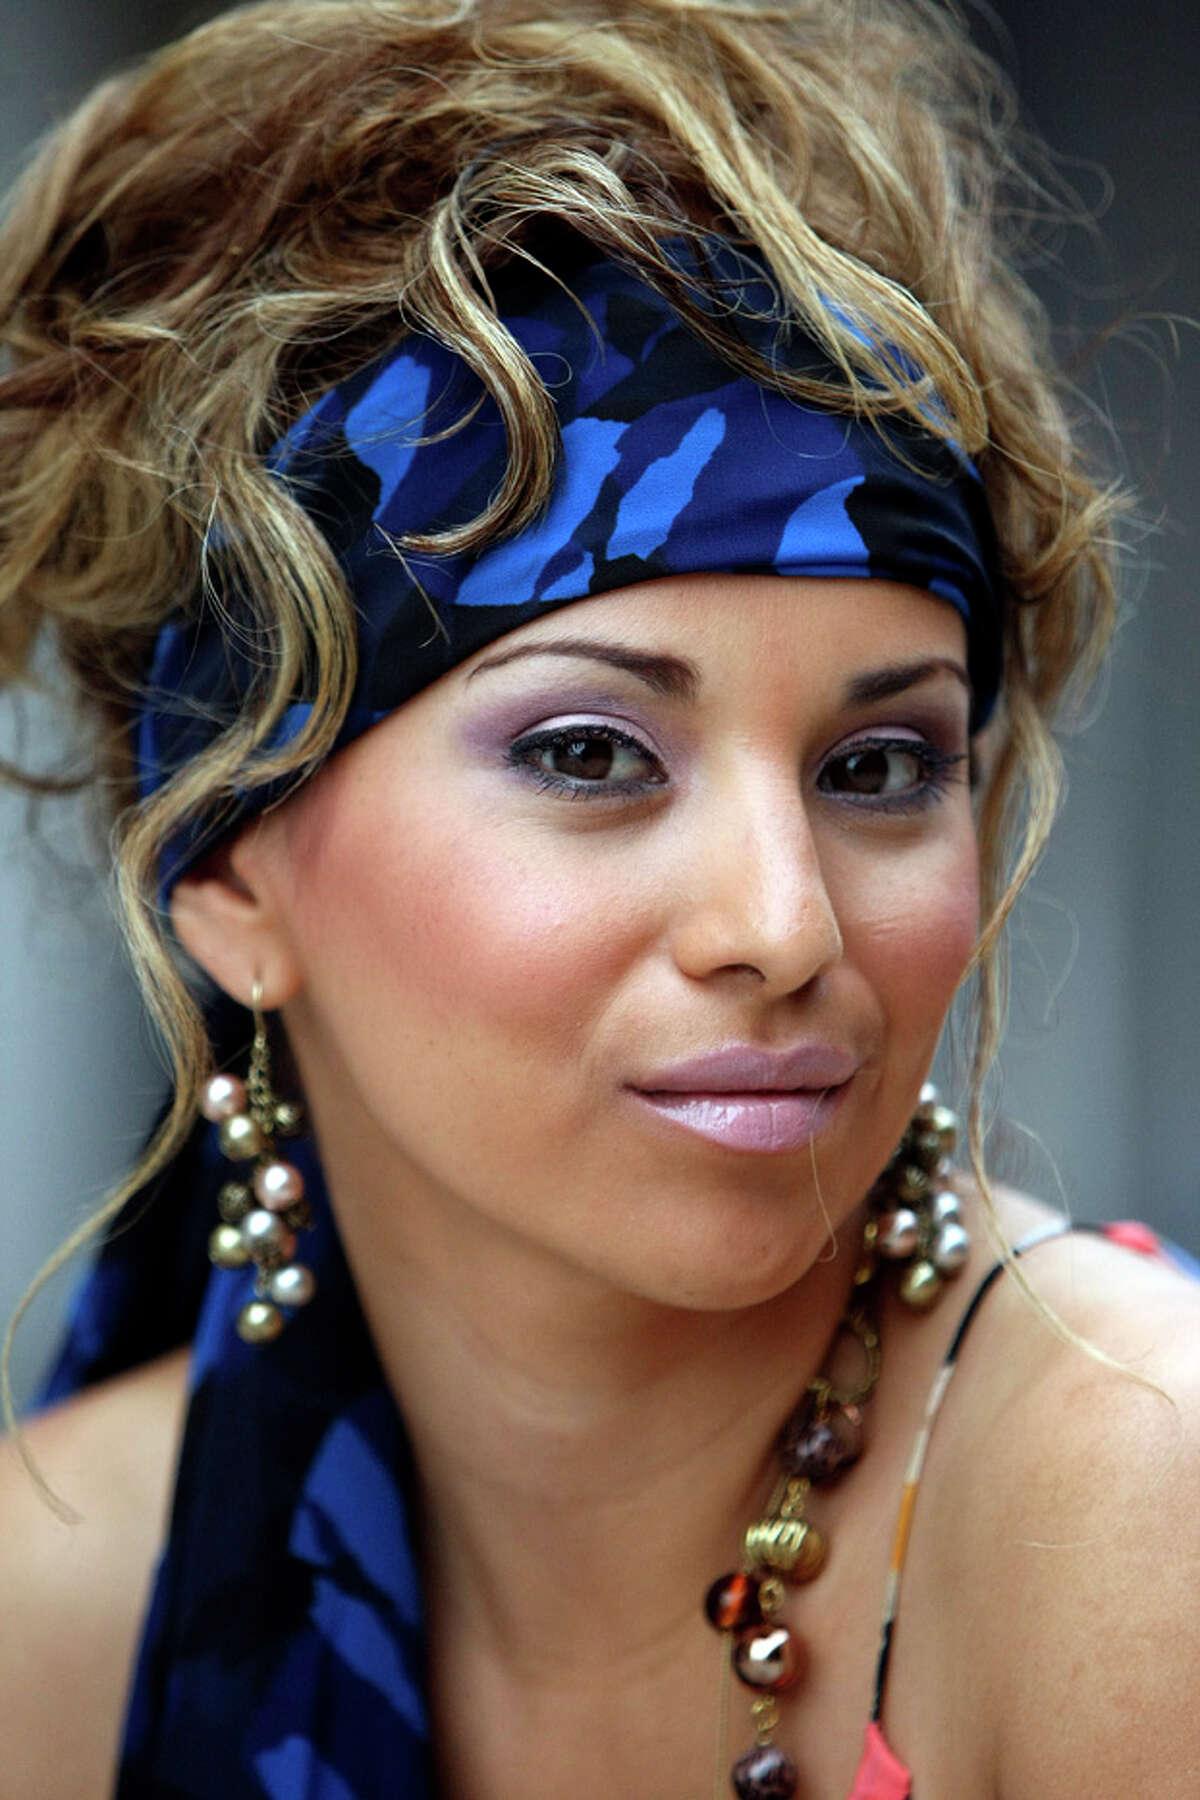 Hottest Latina 2011 Contest winner Luzelena Ortiz-Lopez